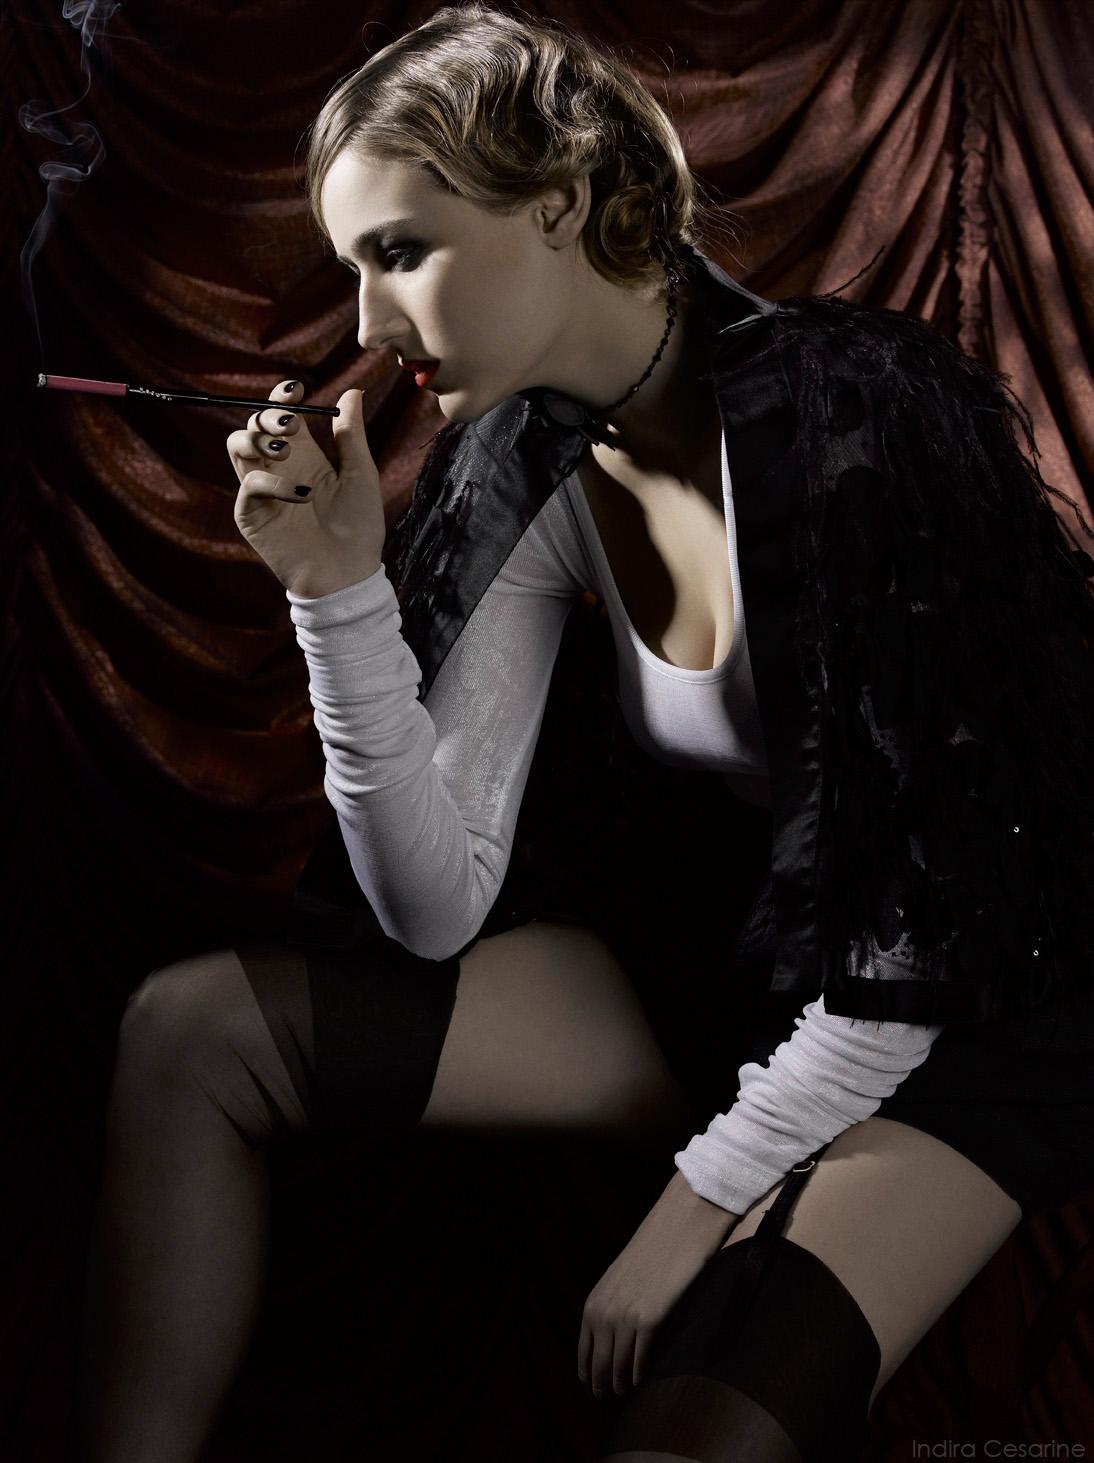 LEELEE-SOBIESKI-Photography-by-Indira-Cesarine-009-x.jpg